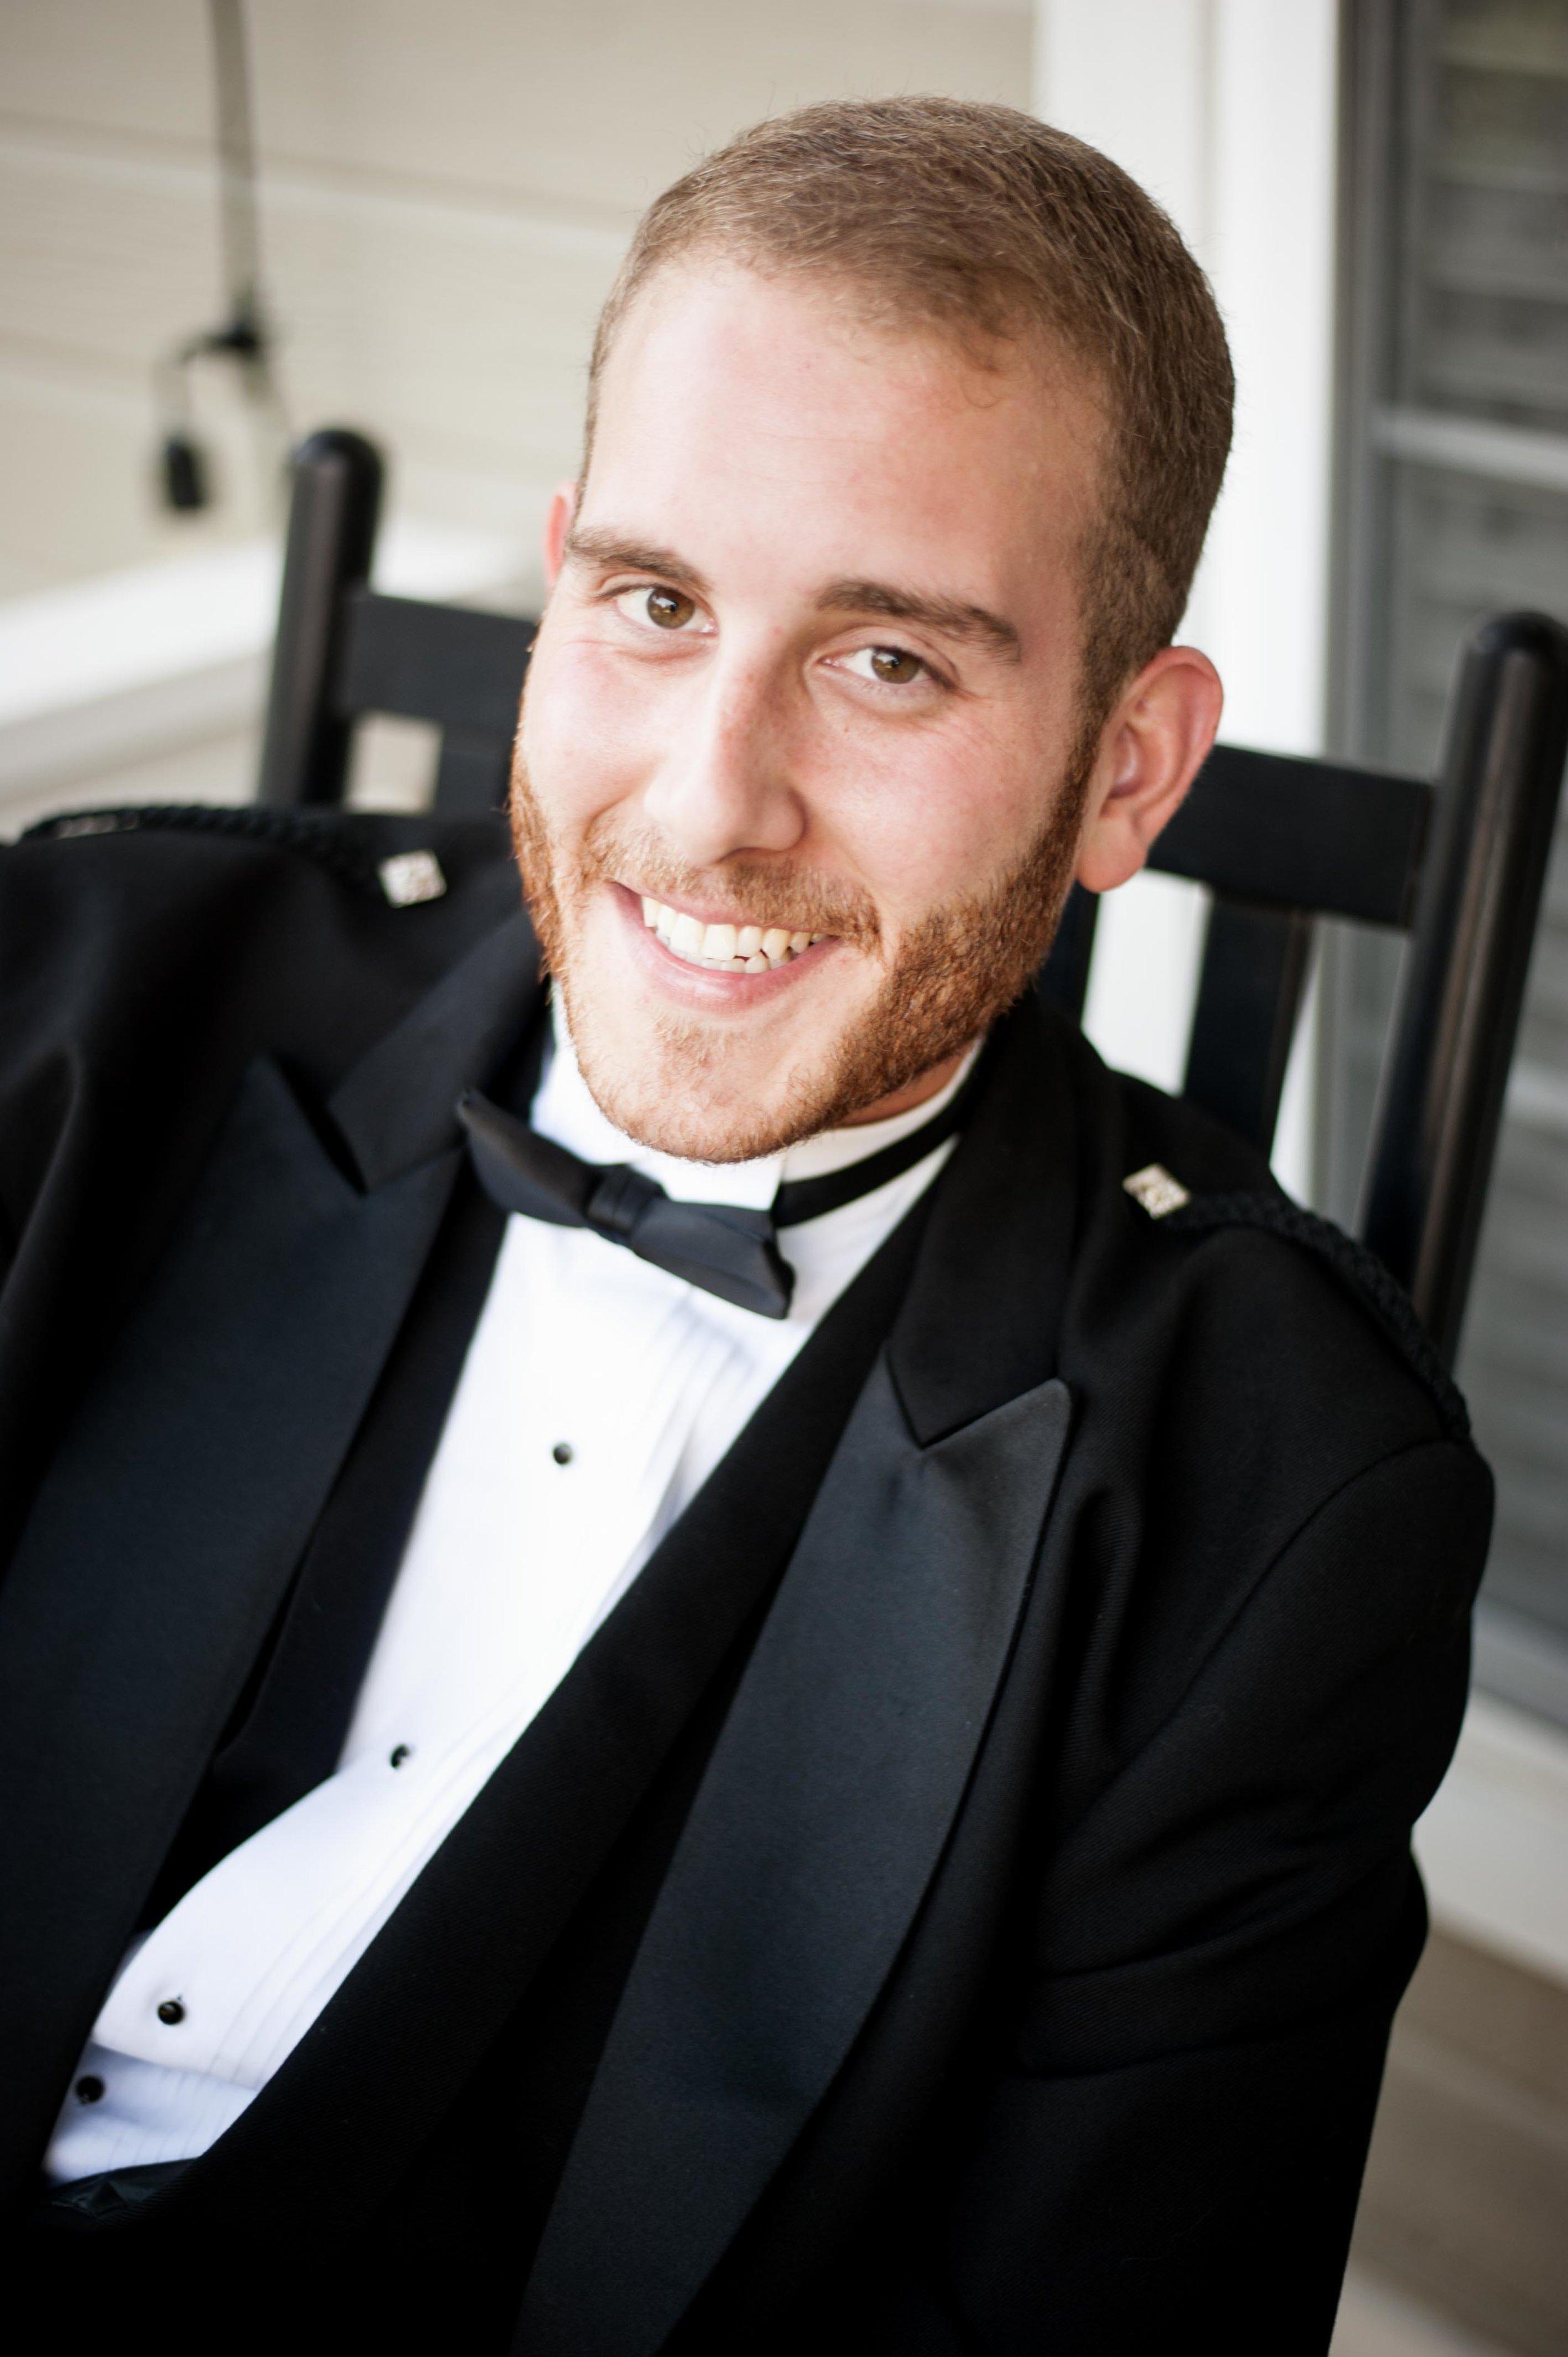 Michael+Nichole Wedding - Formal Portraits-30.jpg